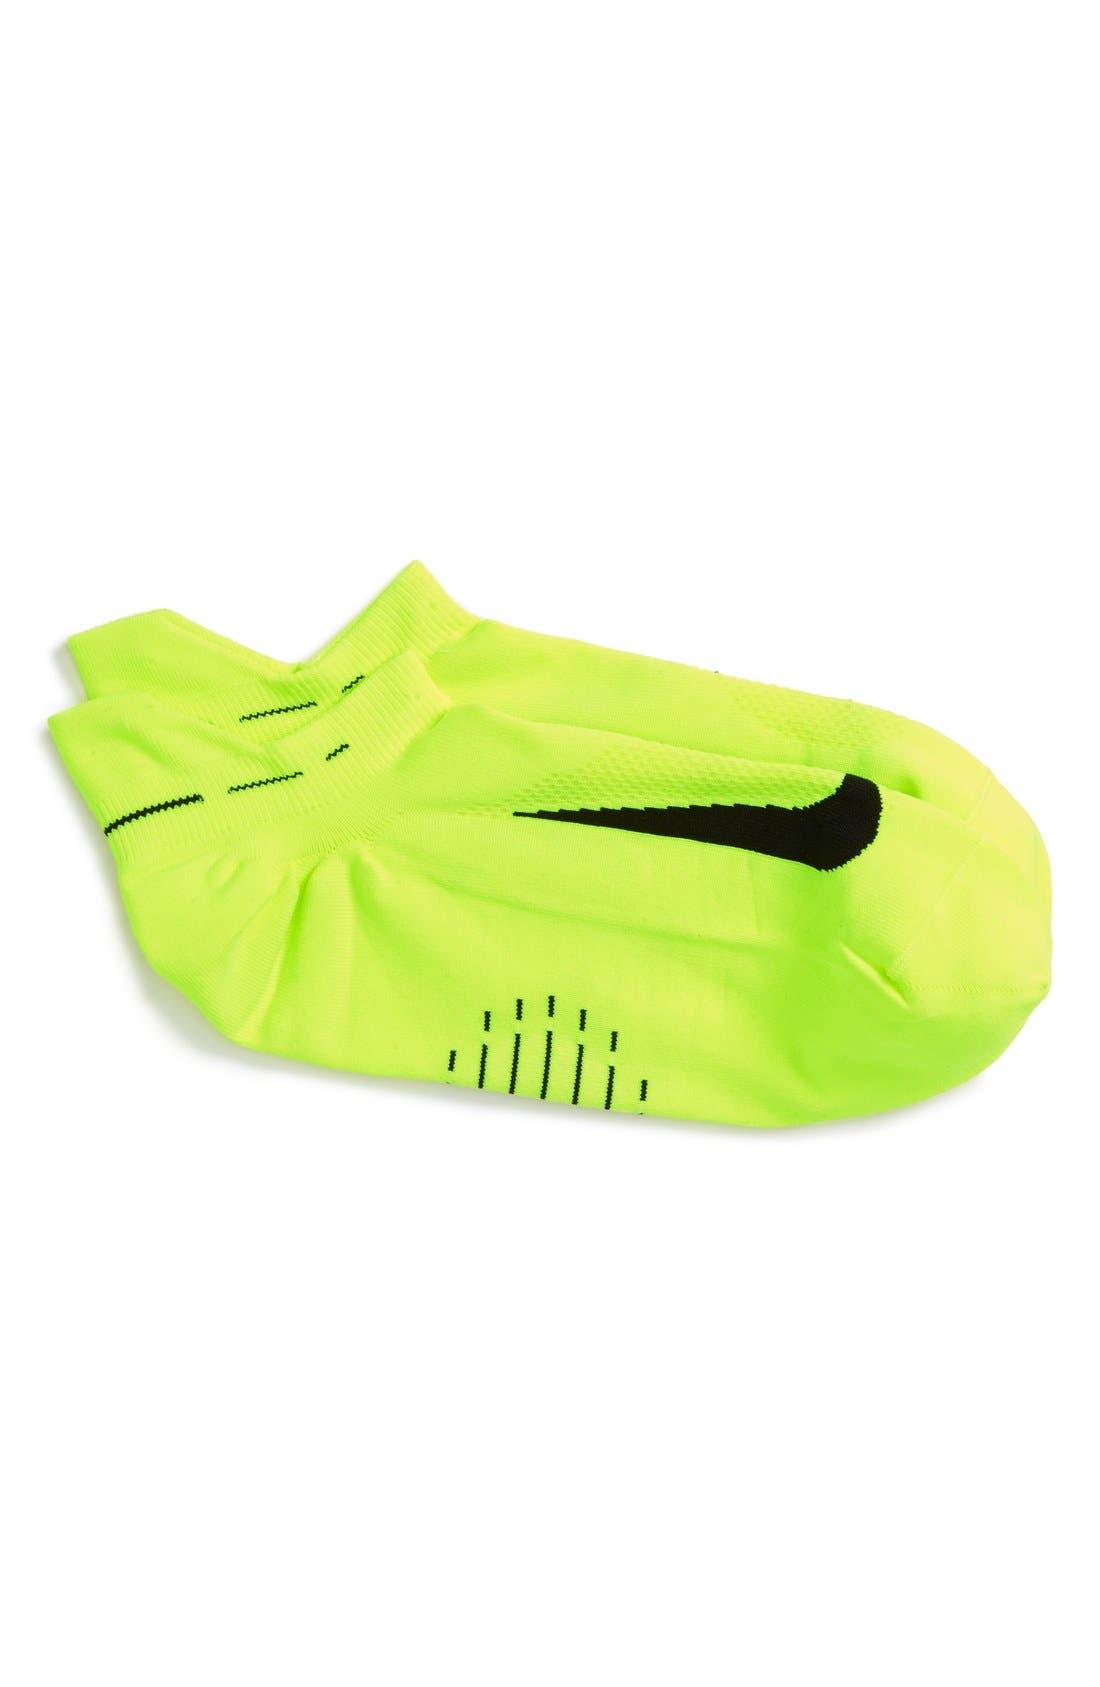 Main Image - Nike 'Elite' Lightweight No-Show Tab Running Socks